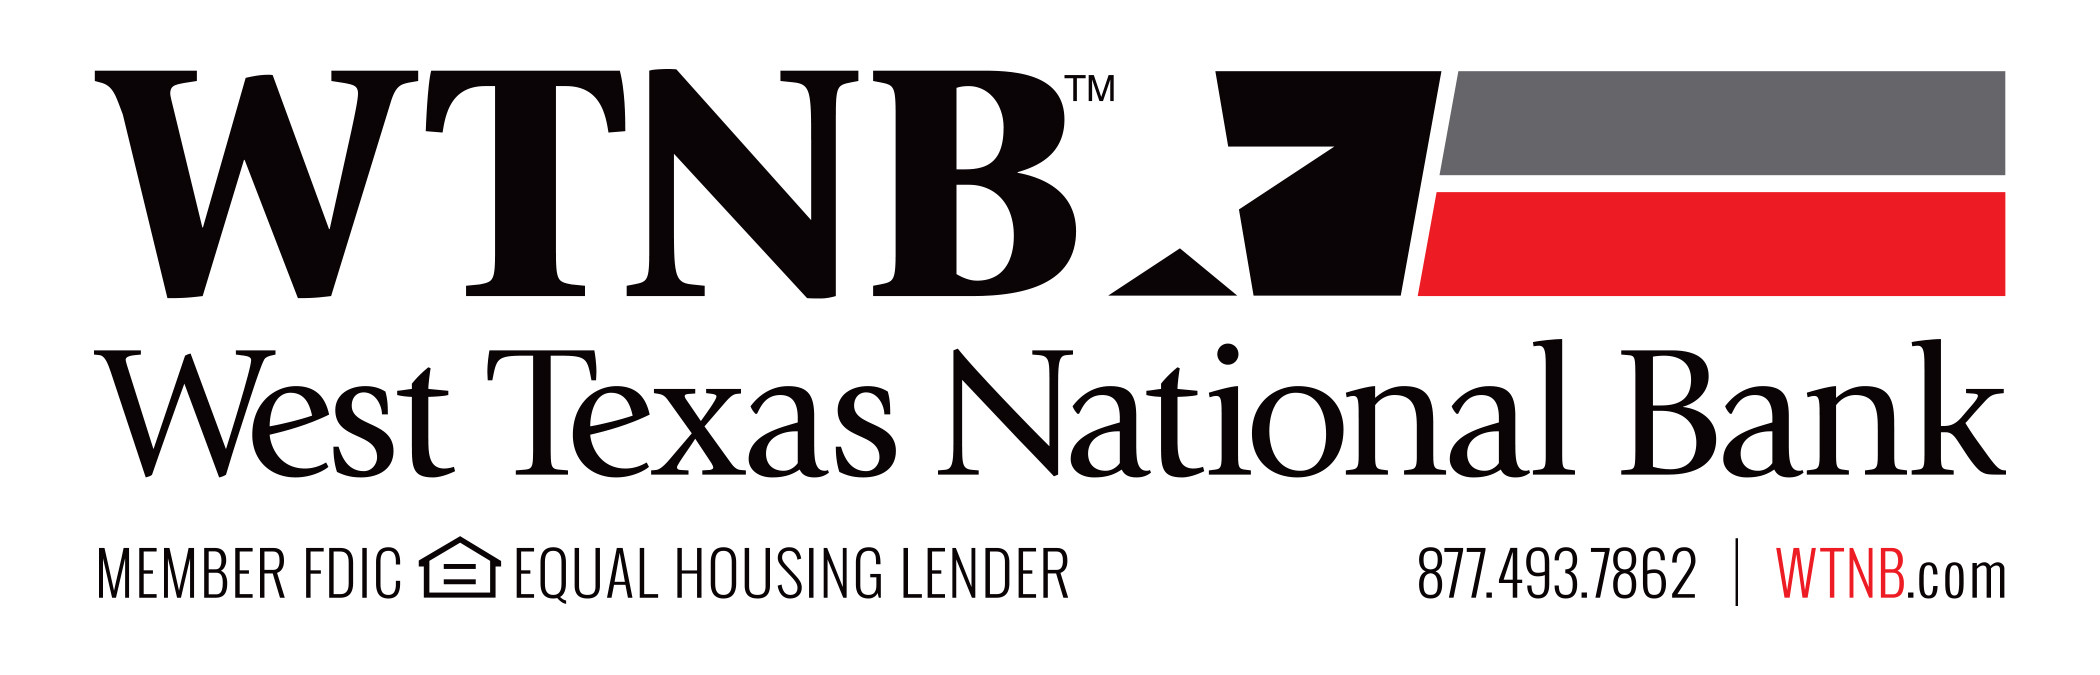 West Texas National Bank logo.jpg